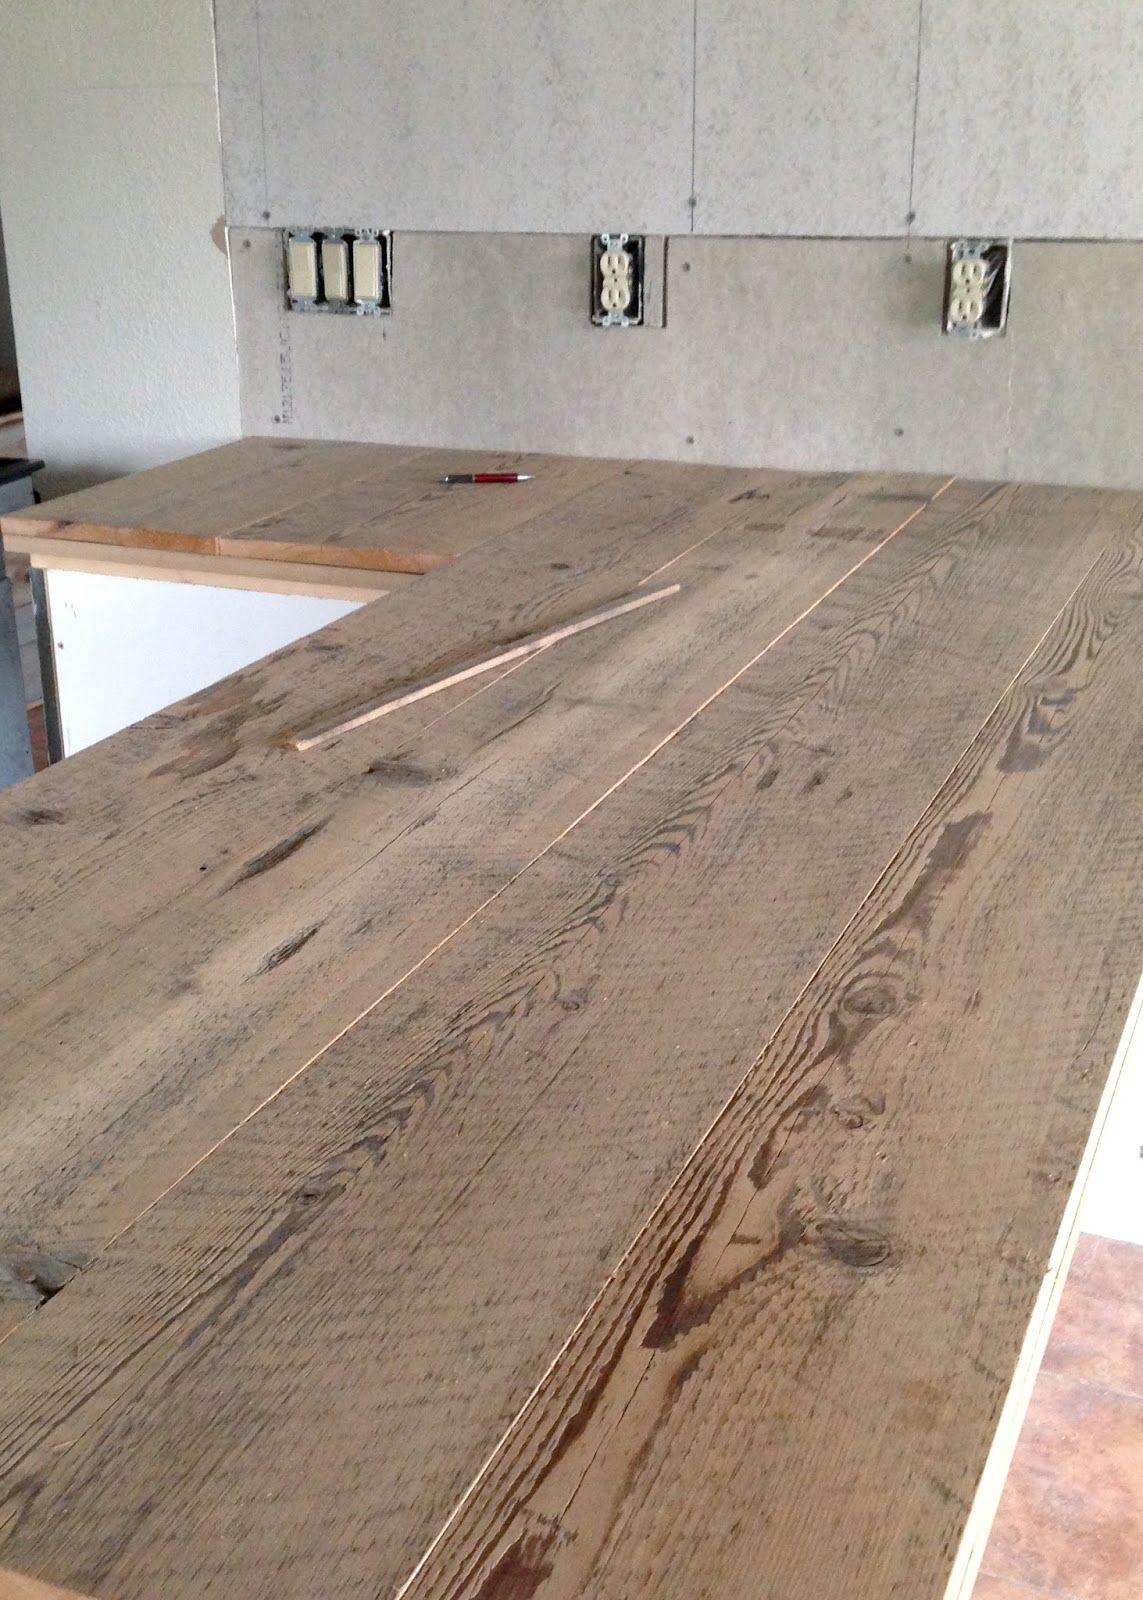 hardwood flooring countertops diy of diy reclaimed wood countertop renovation pinterest reclaimed throughout diy reclaimed wood countertop gluing and nailing down reclaimed wood boards